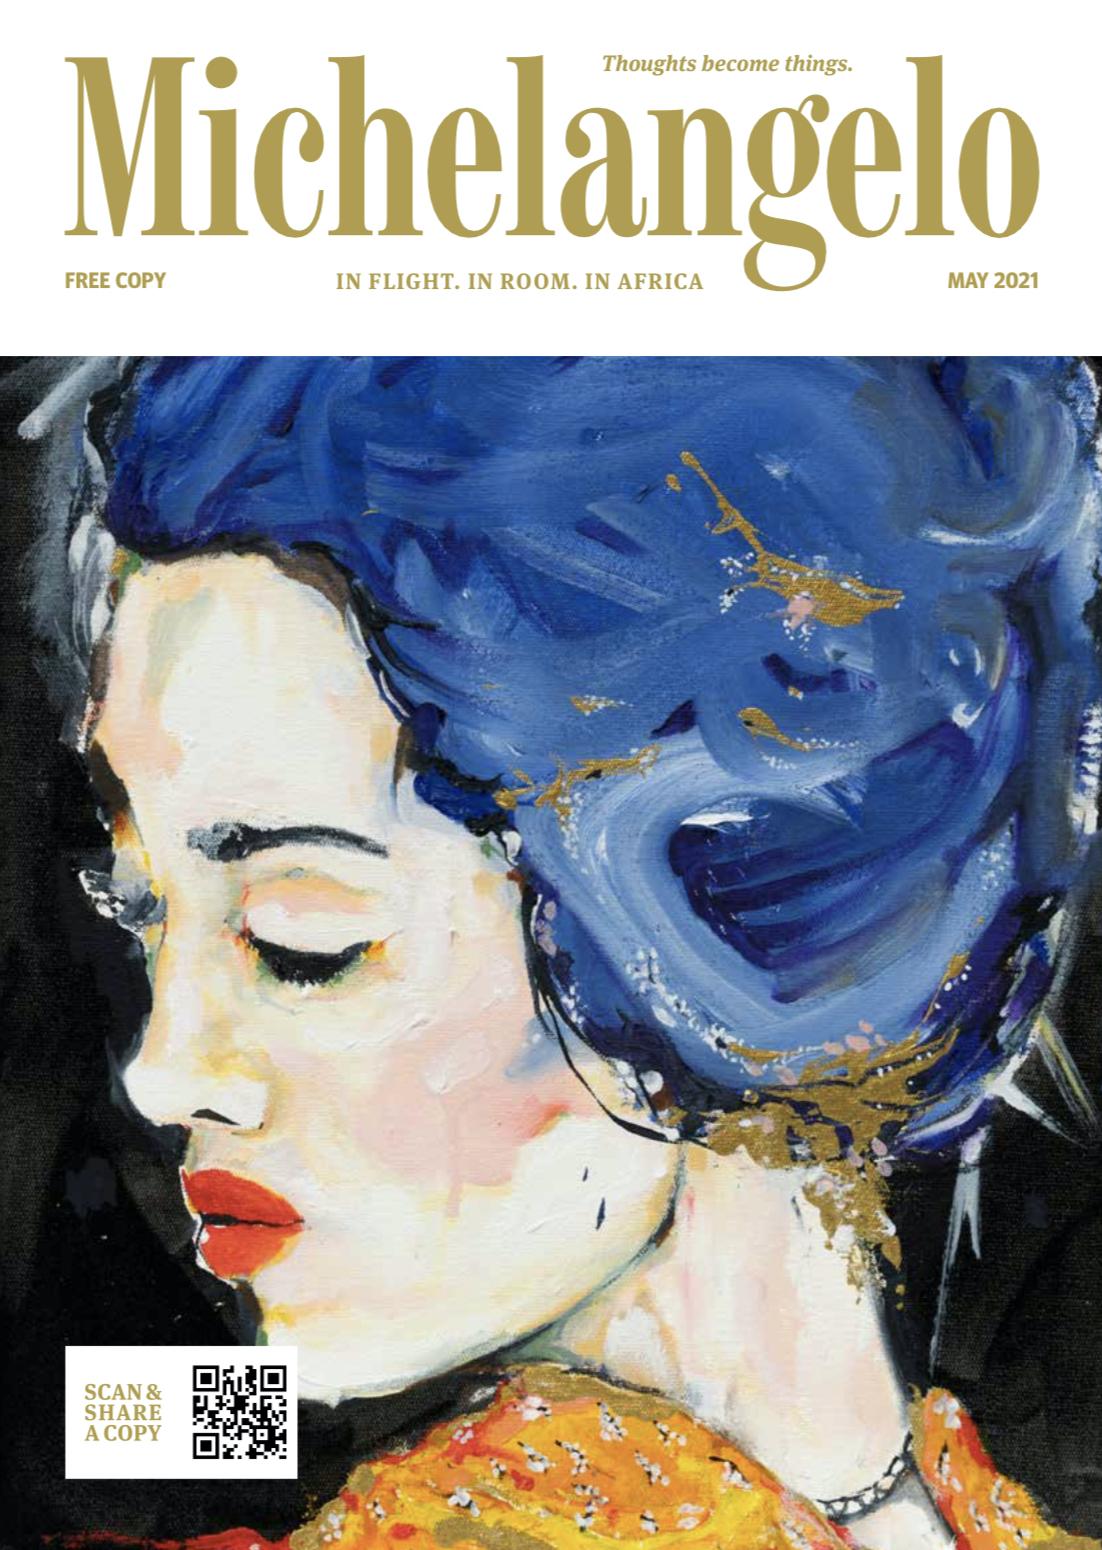 Michaelangelo Cover May 2021